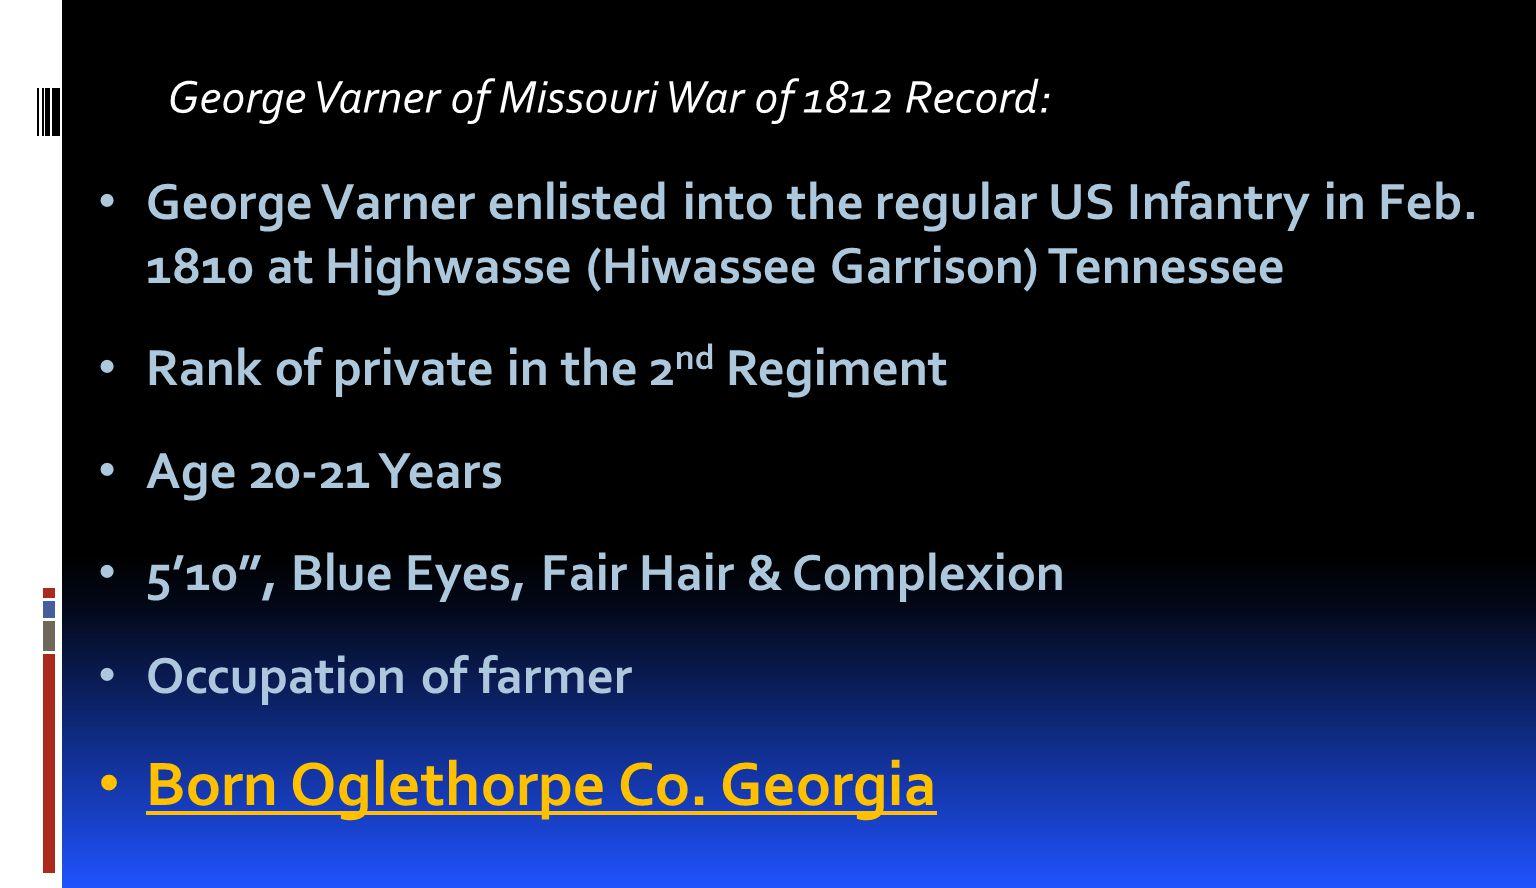 Born Oglethorpe Co. Georgia